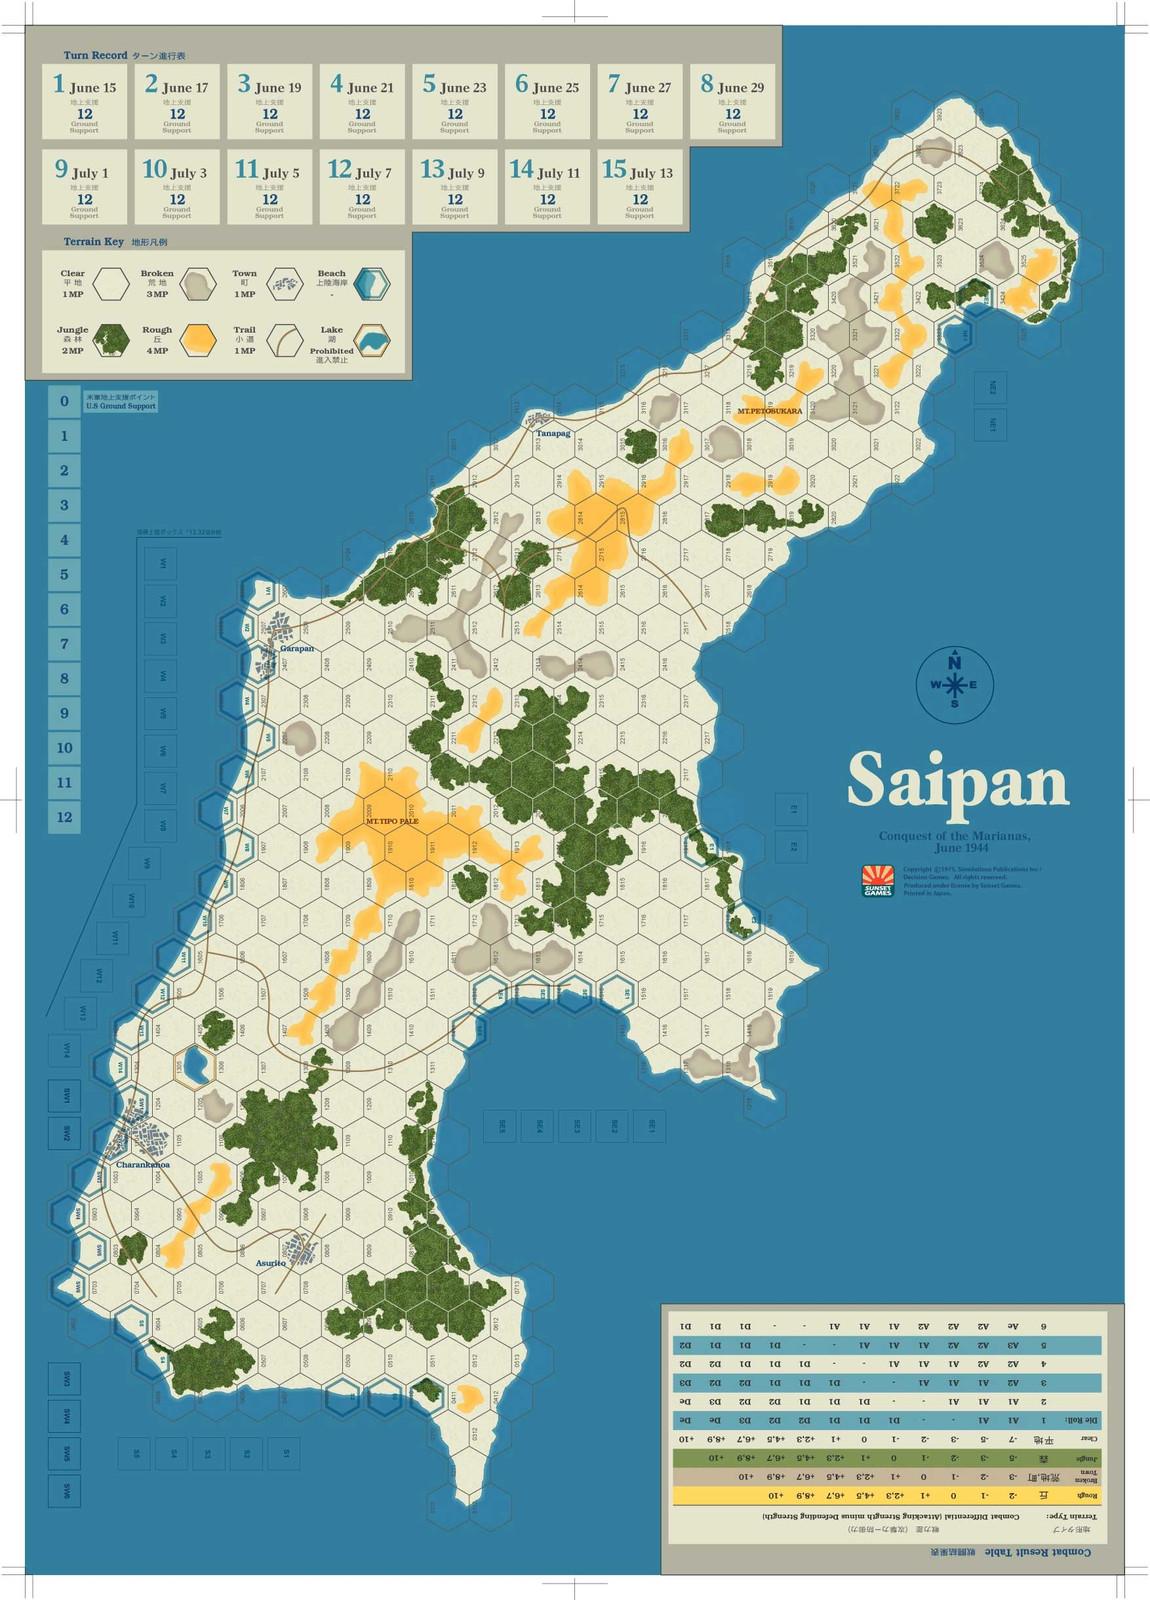 Iwsaipanmap_v3